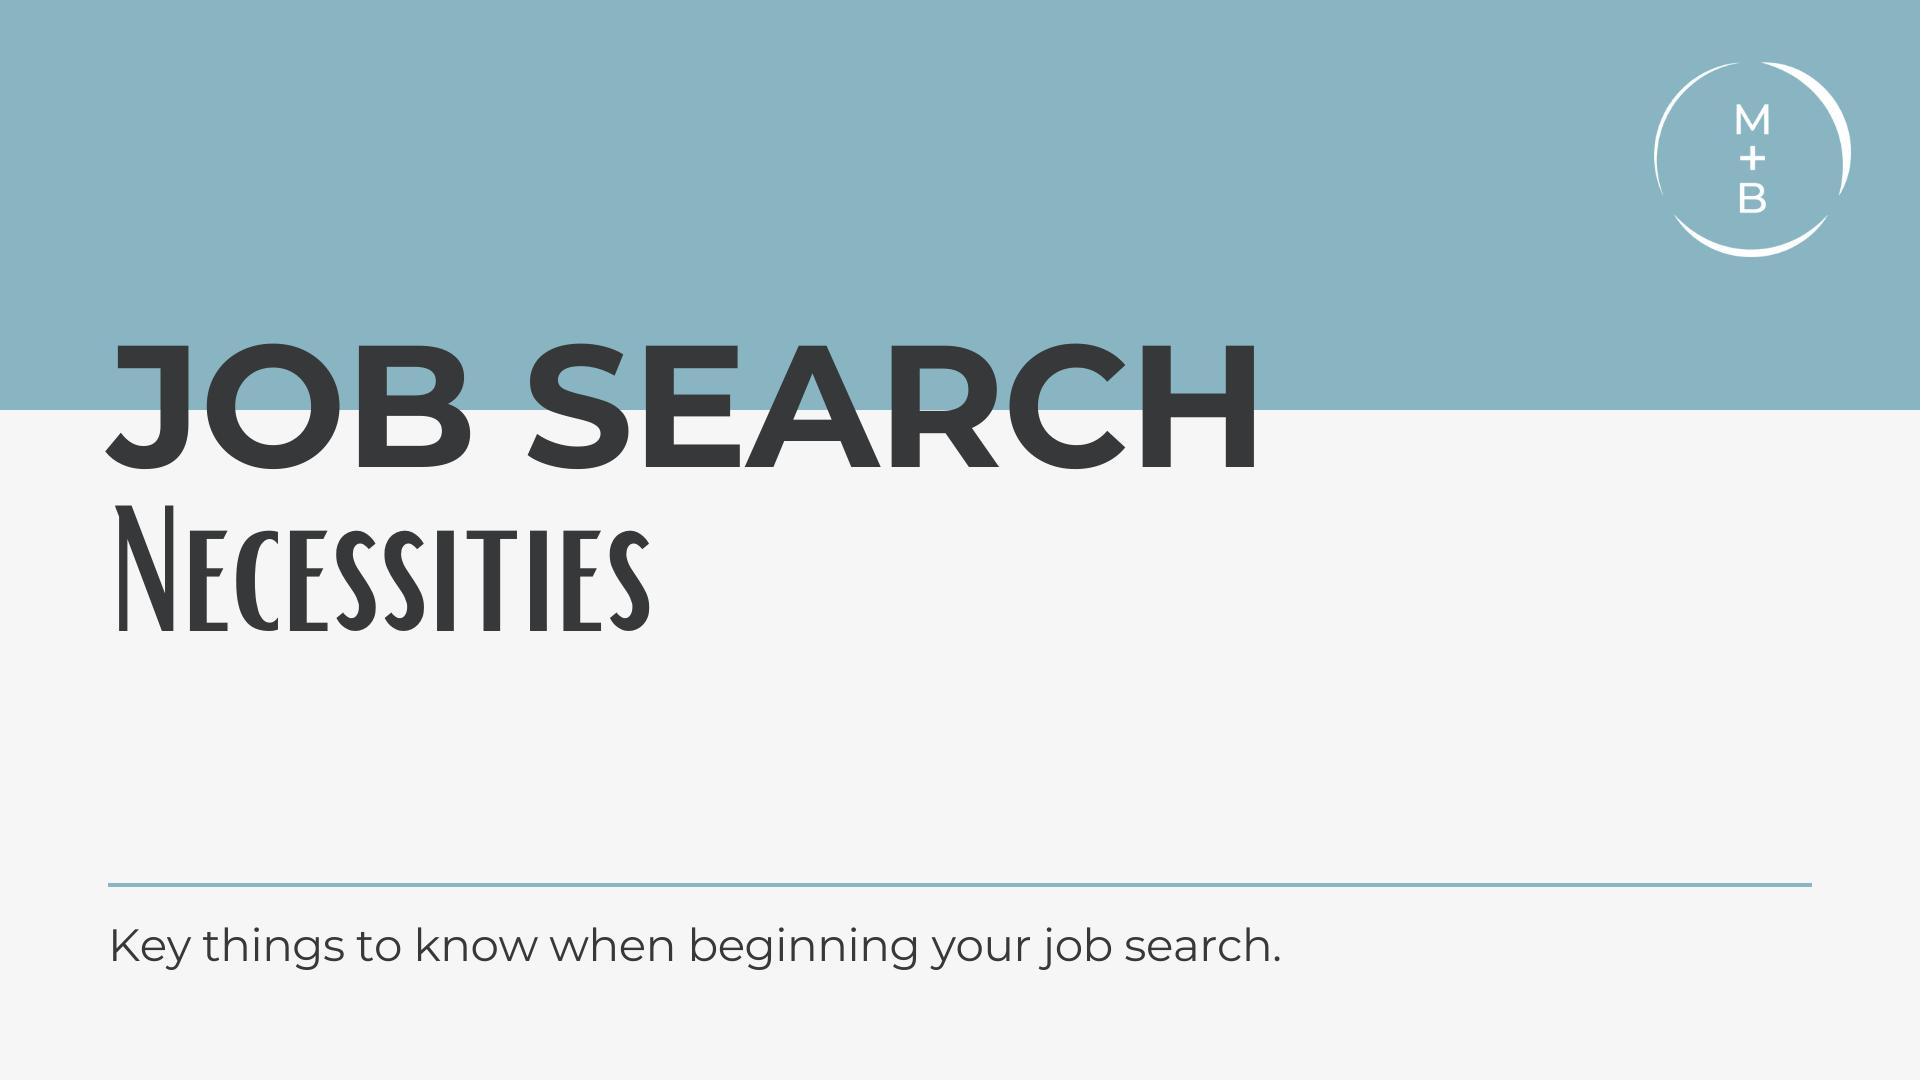 M+B Webcast_ Job Search Necessities Presentation